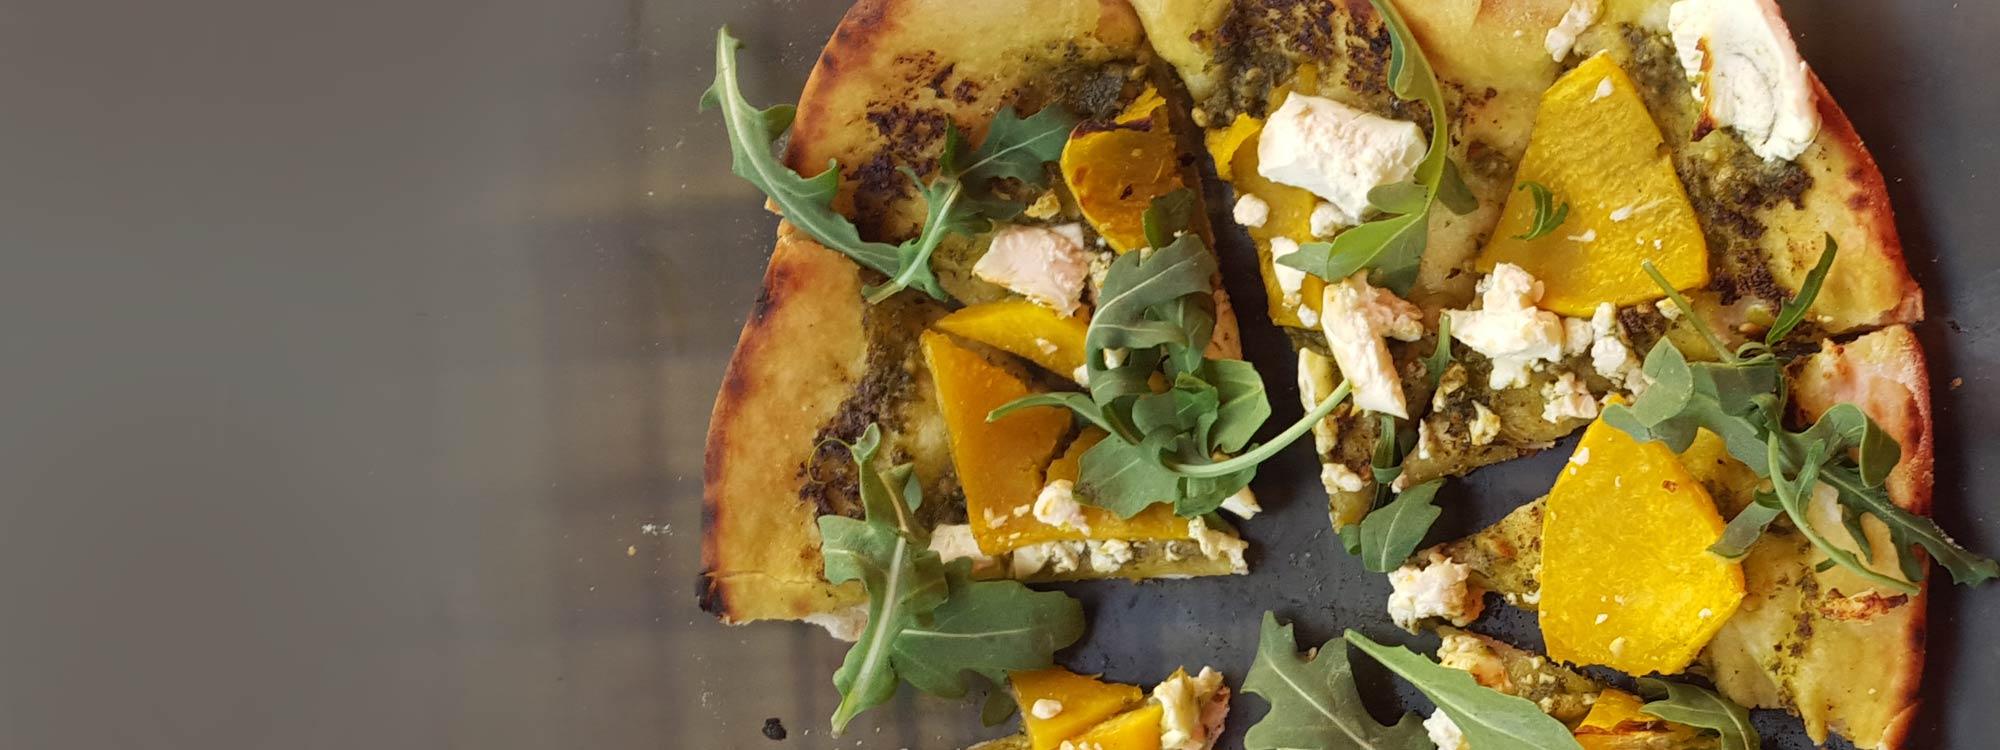 pizza-close-up-slider